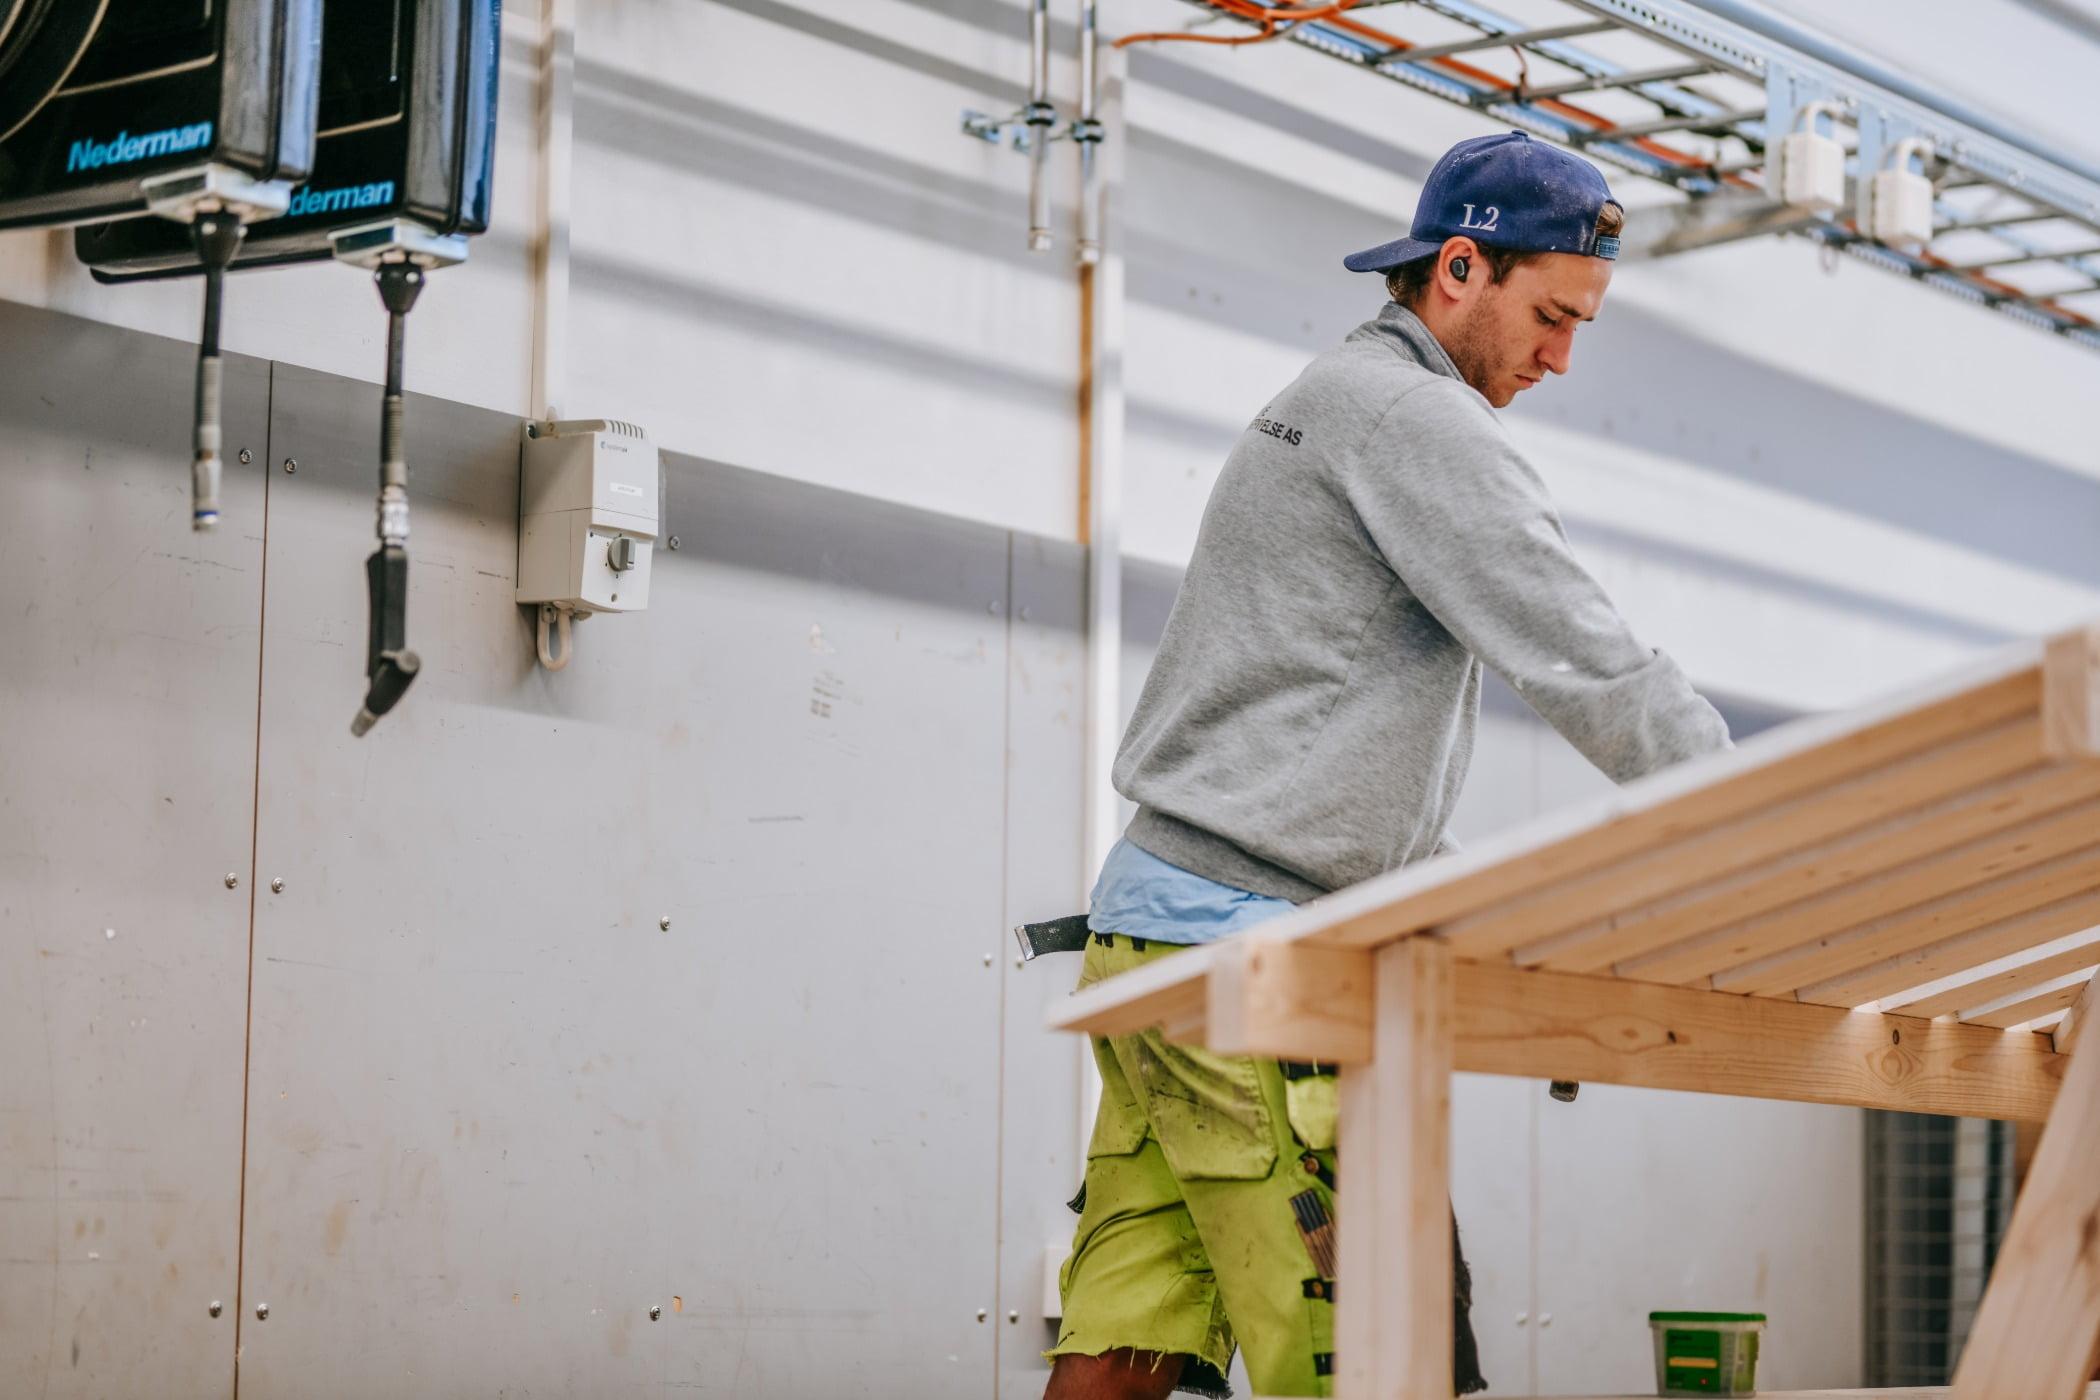 Hard hat, Construction worker, Tradesman, Workwear, Building, Wood, Yellow, Wall, Headgear